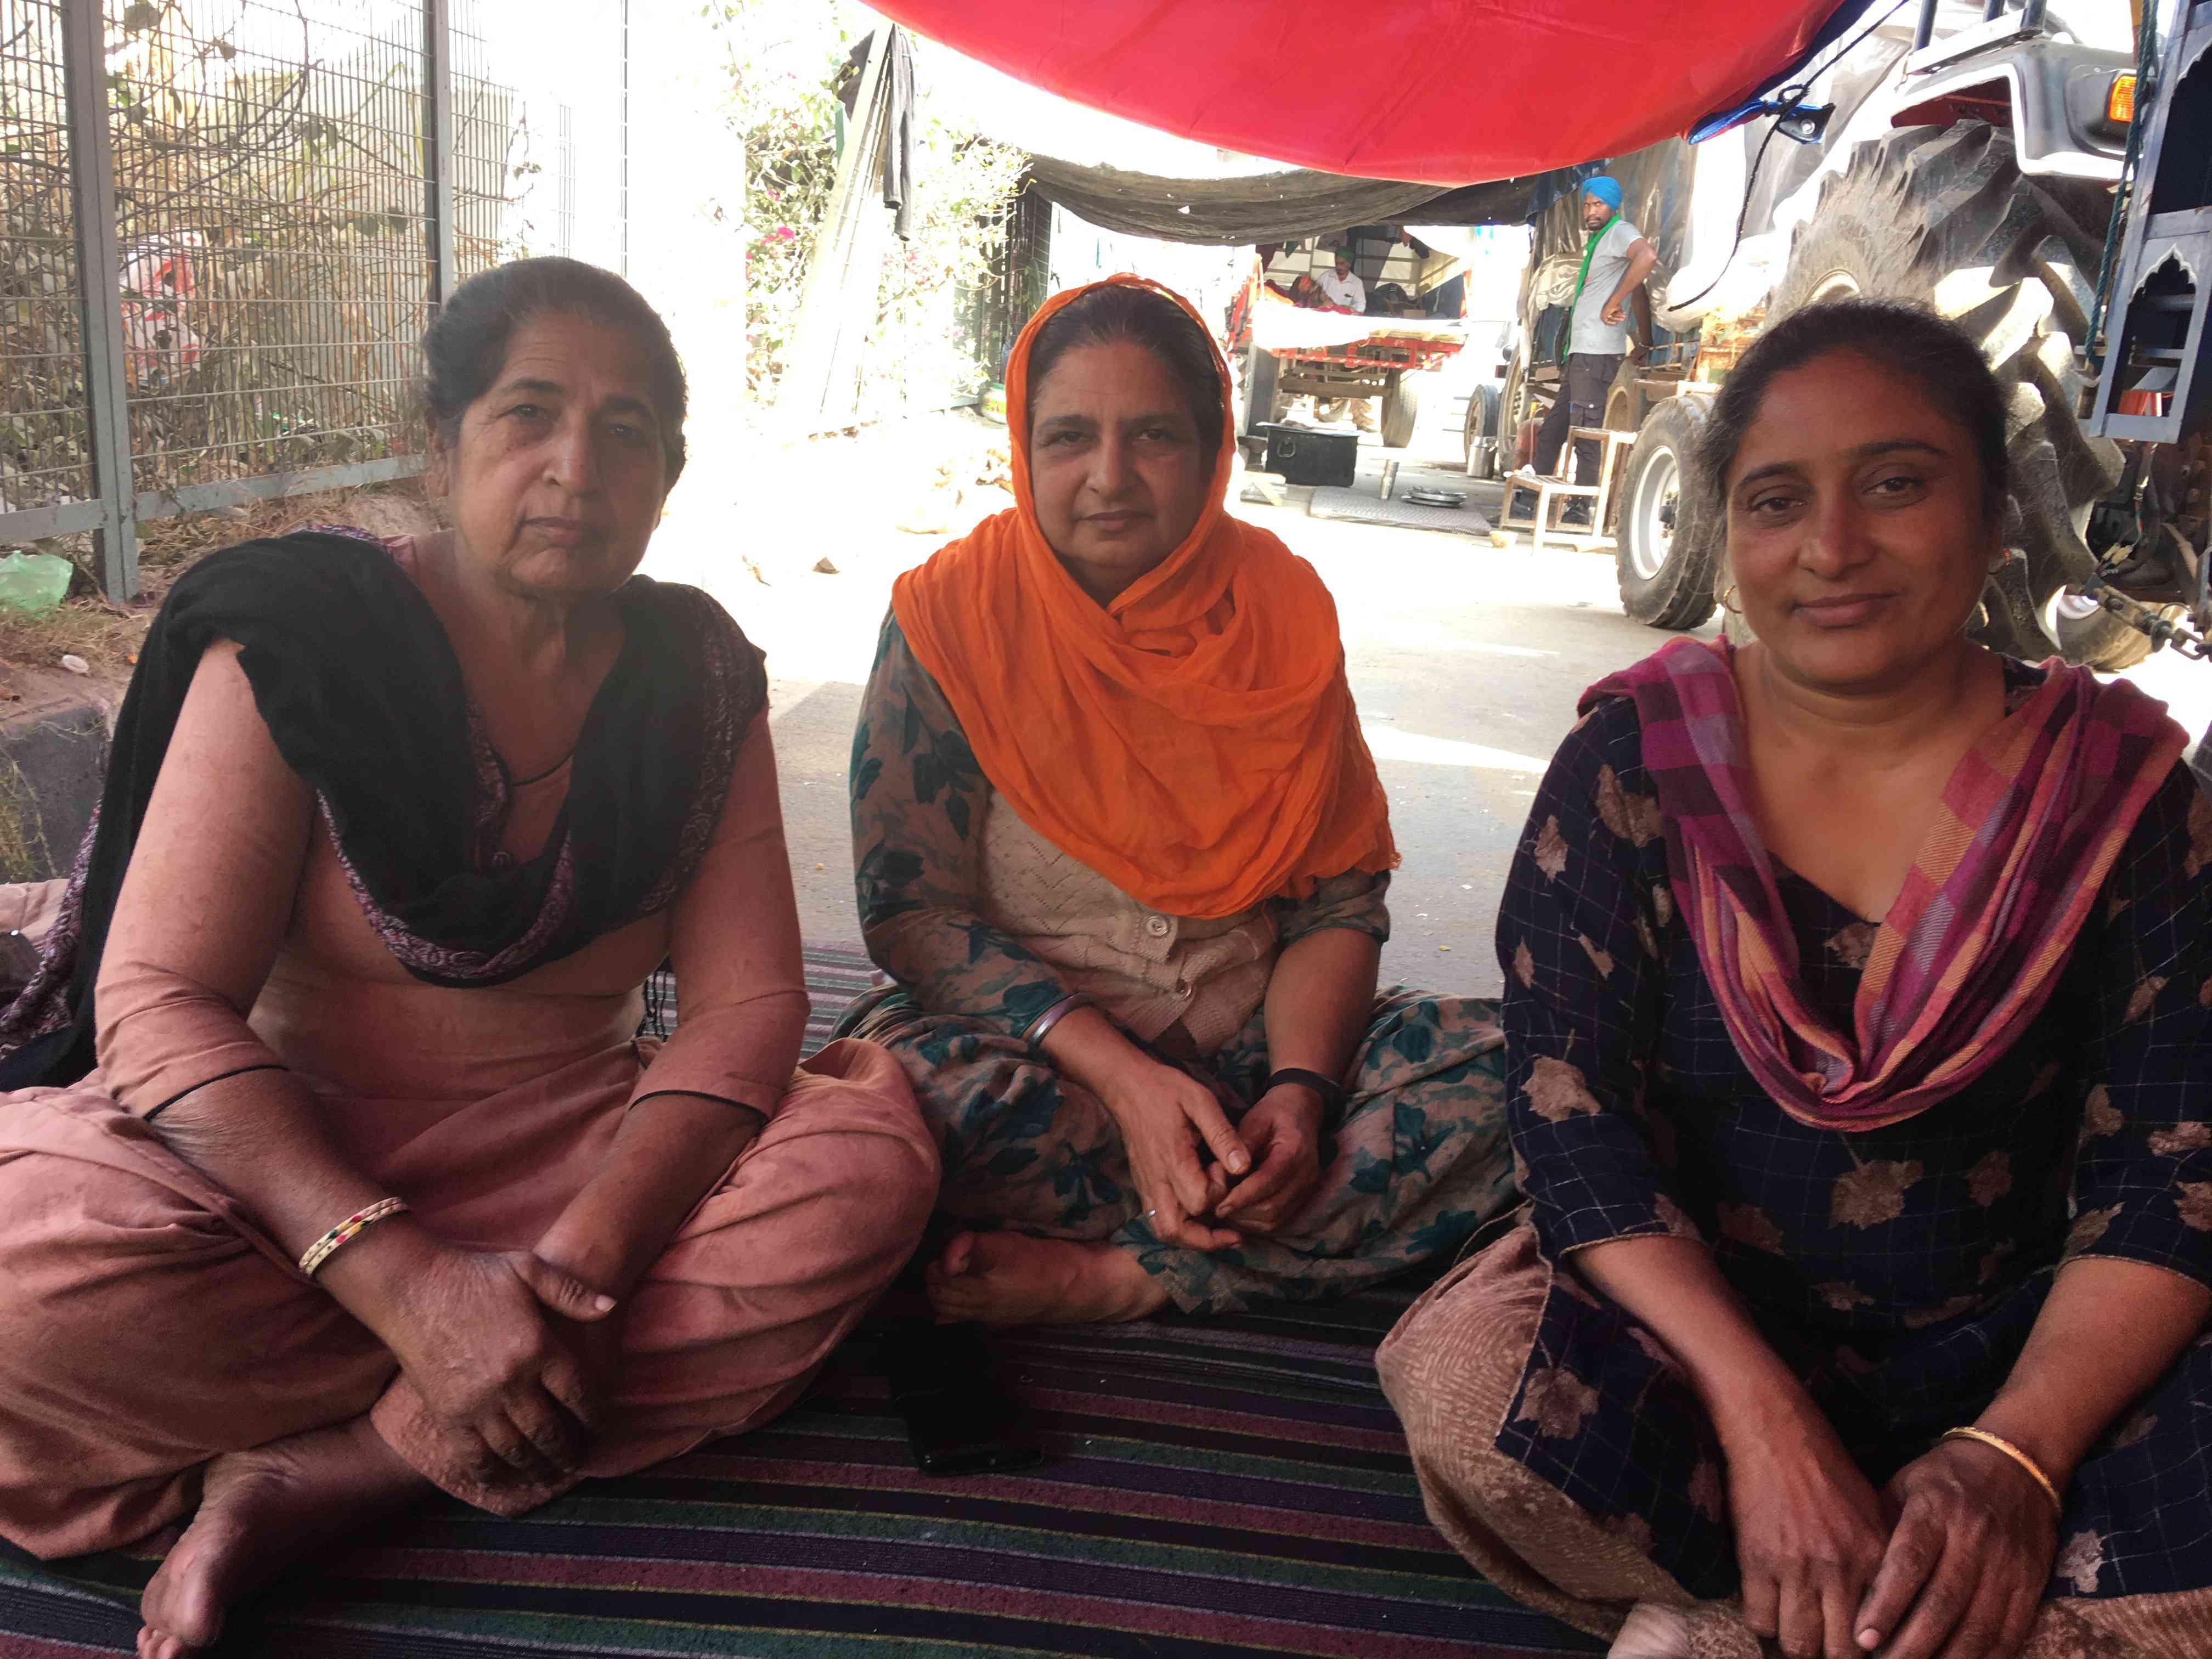 Sharanjeet Kaur (چپ) ، Harpreet Kaur (مرکز) و Gurpreet Kaur (راست) از Ludhiana ، پنجاب به مرز Tikri آمدند.